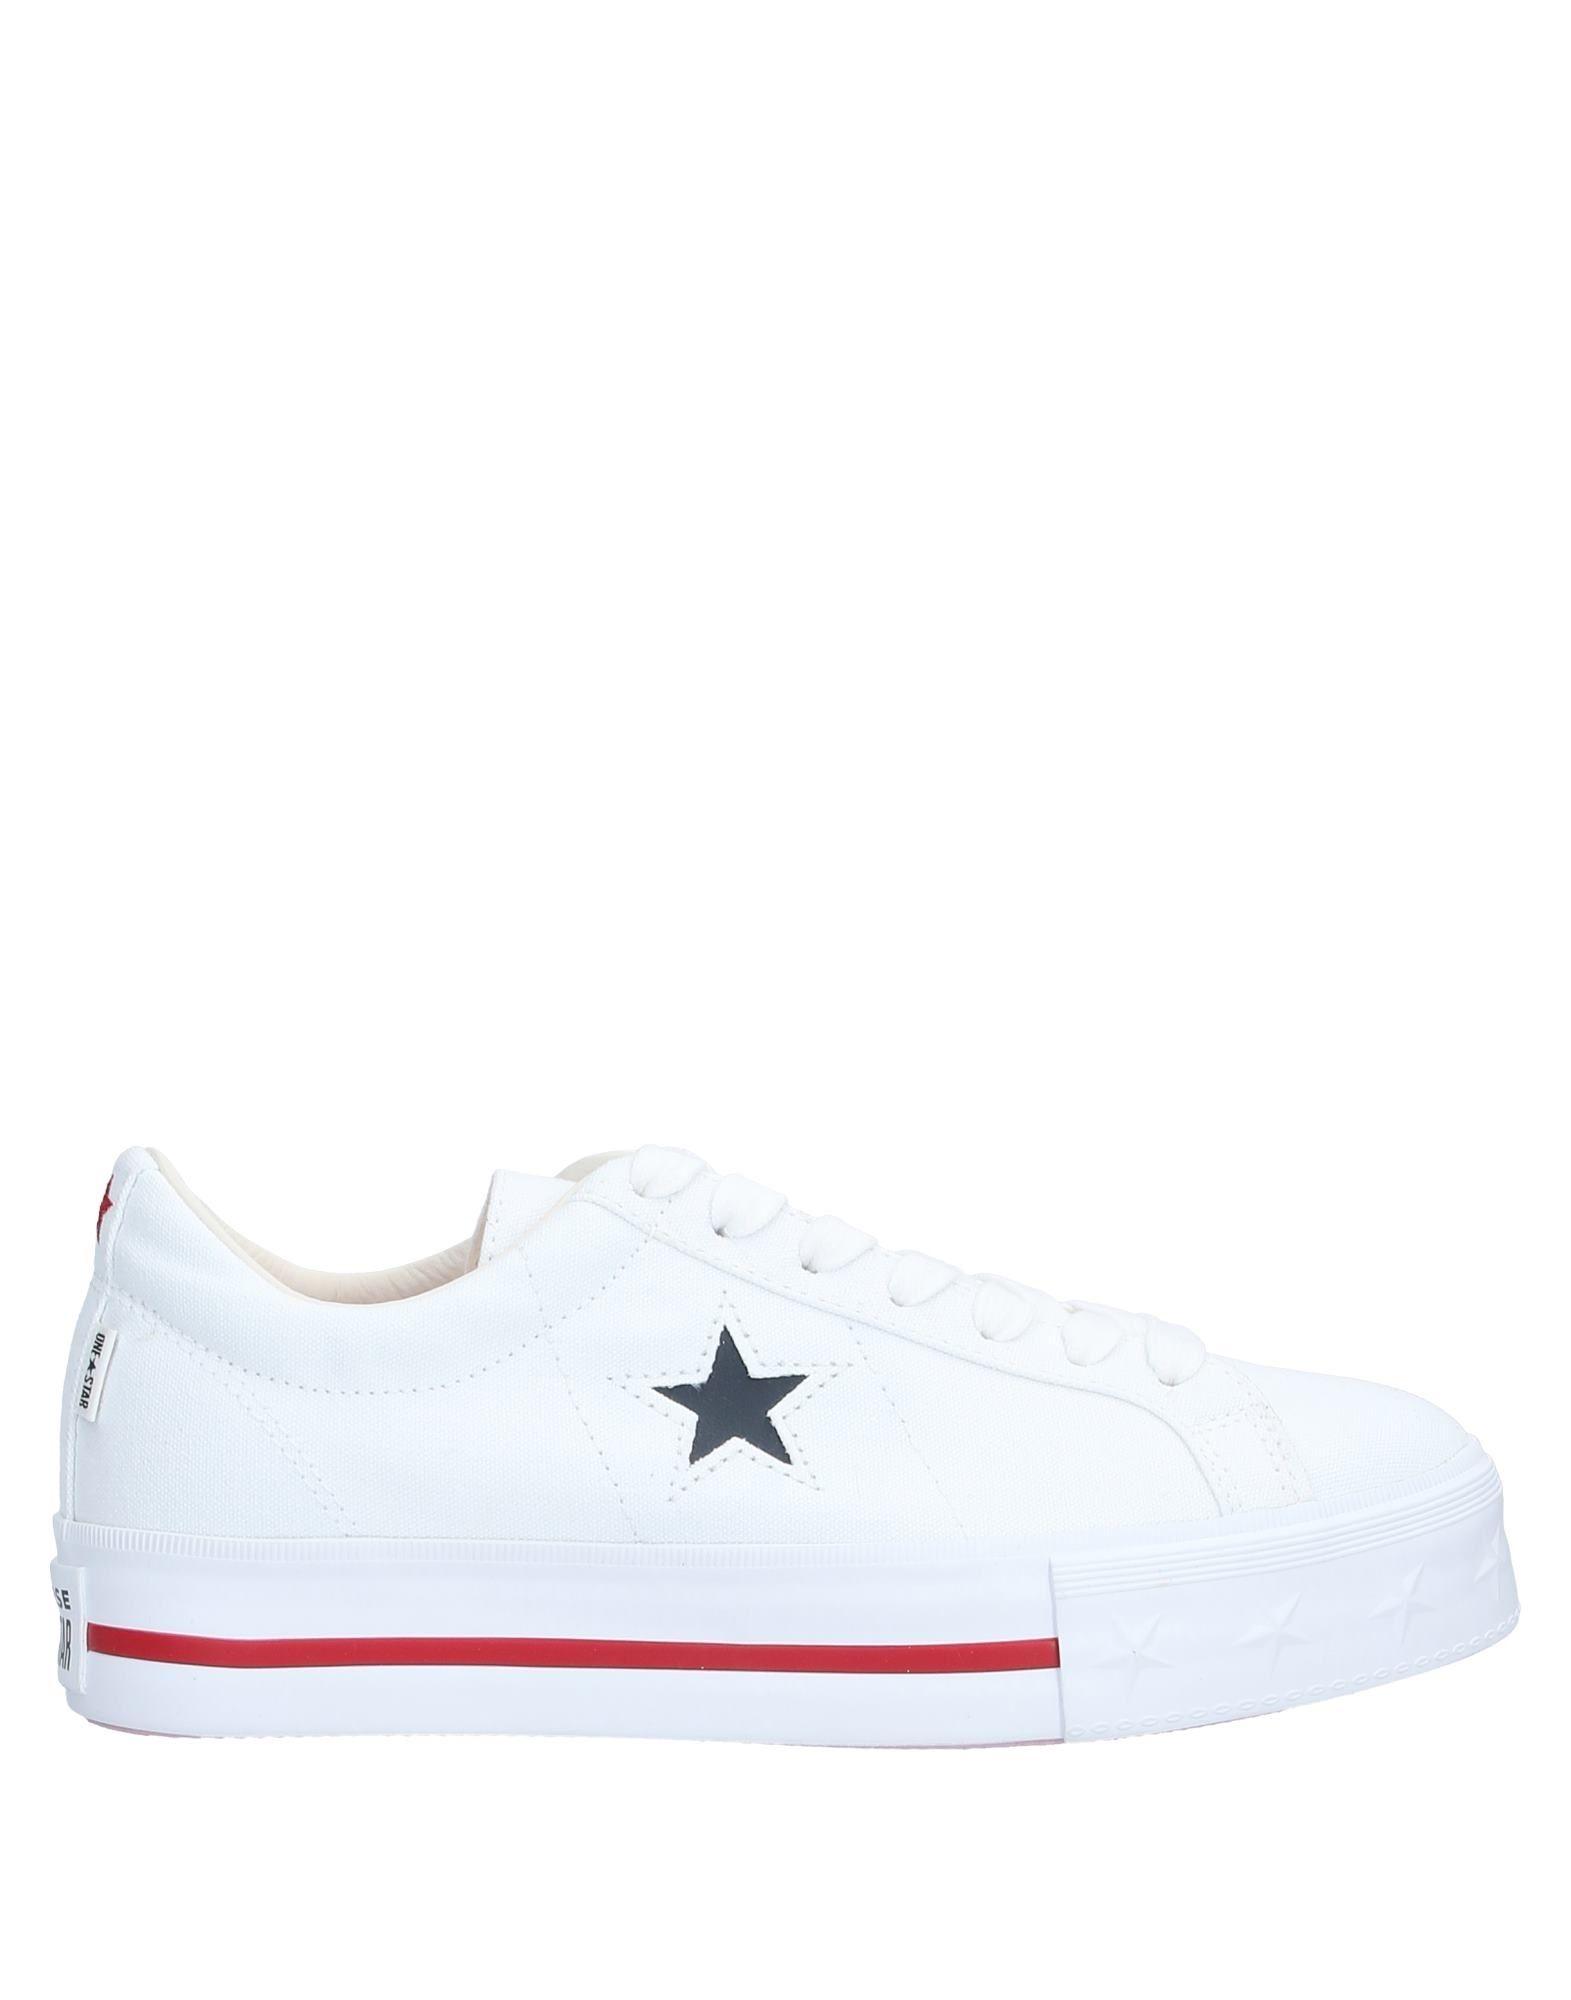 CONVERSE ONE STAR Низкие кеды и кроссовки converse зеленые замшевые кеды one star